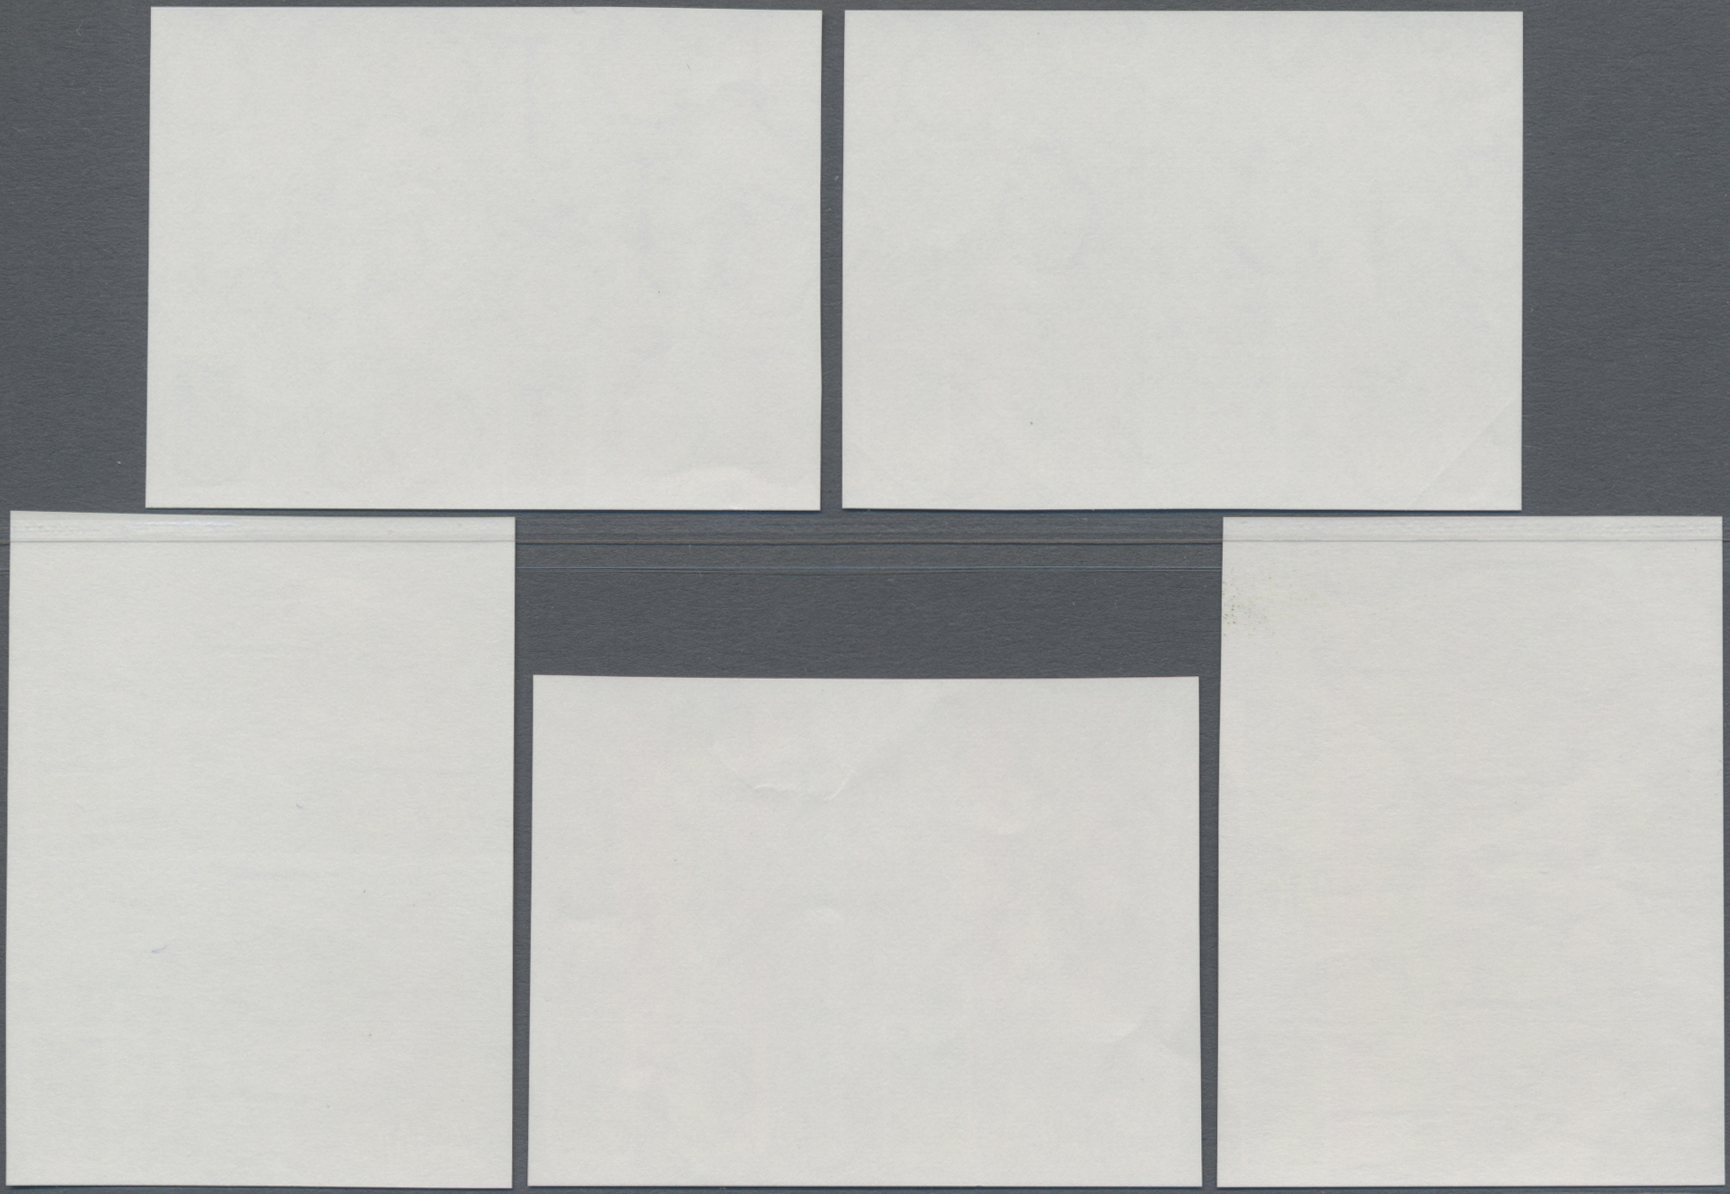 Lot 11873 - thematik: sport / sport  -  Auktionshaus Christoph Gärtner GmbH & Co. KG Sale #47 Single lots: Asia, Thematics, Overseas, Europe